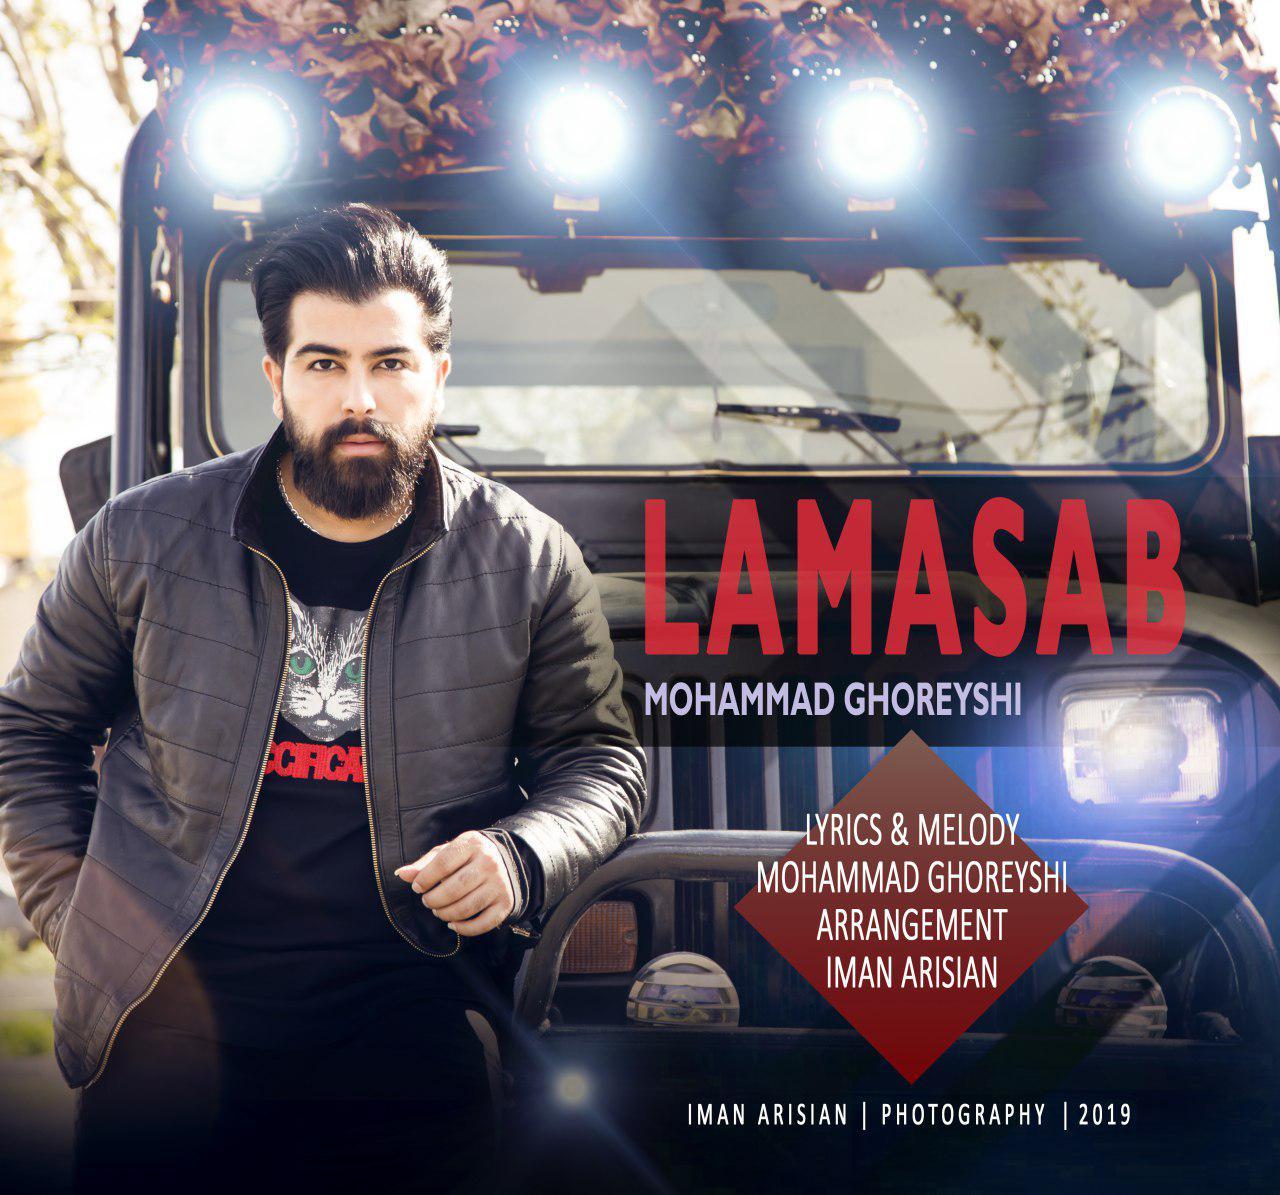 Mohammad Ghoreyshi – Lamasab